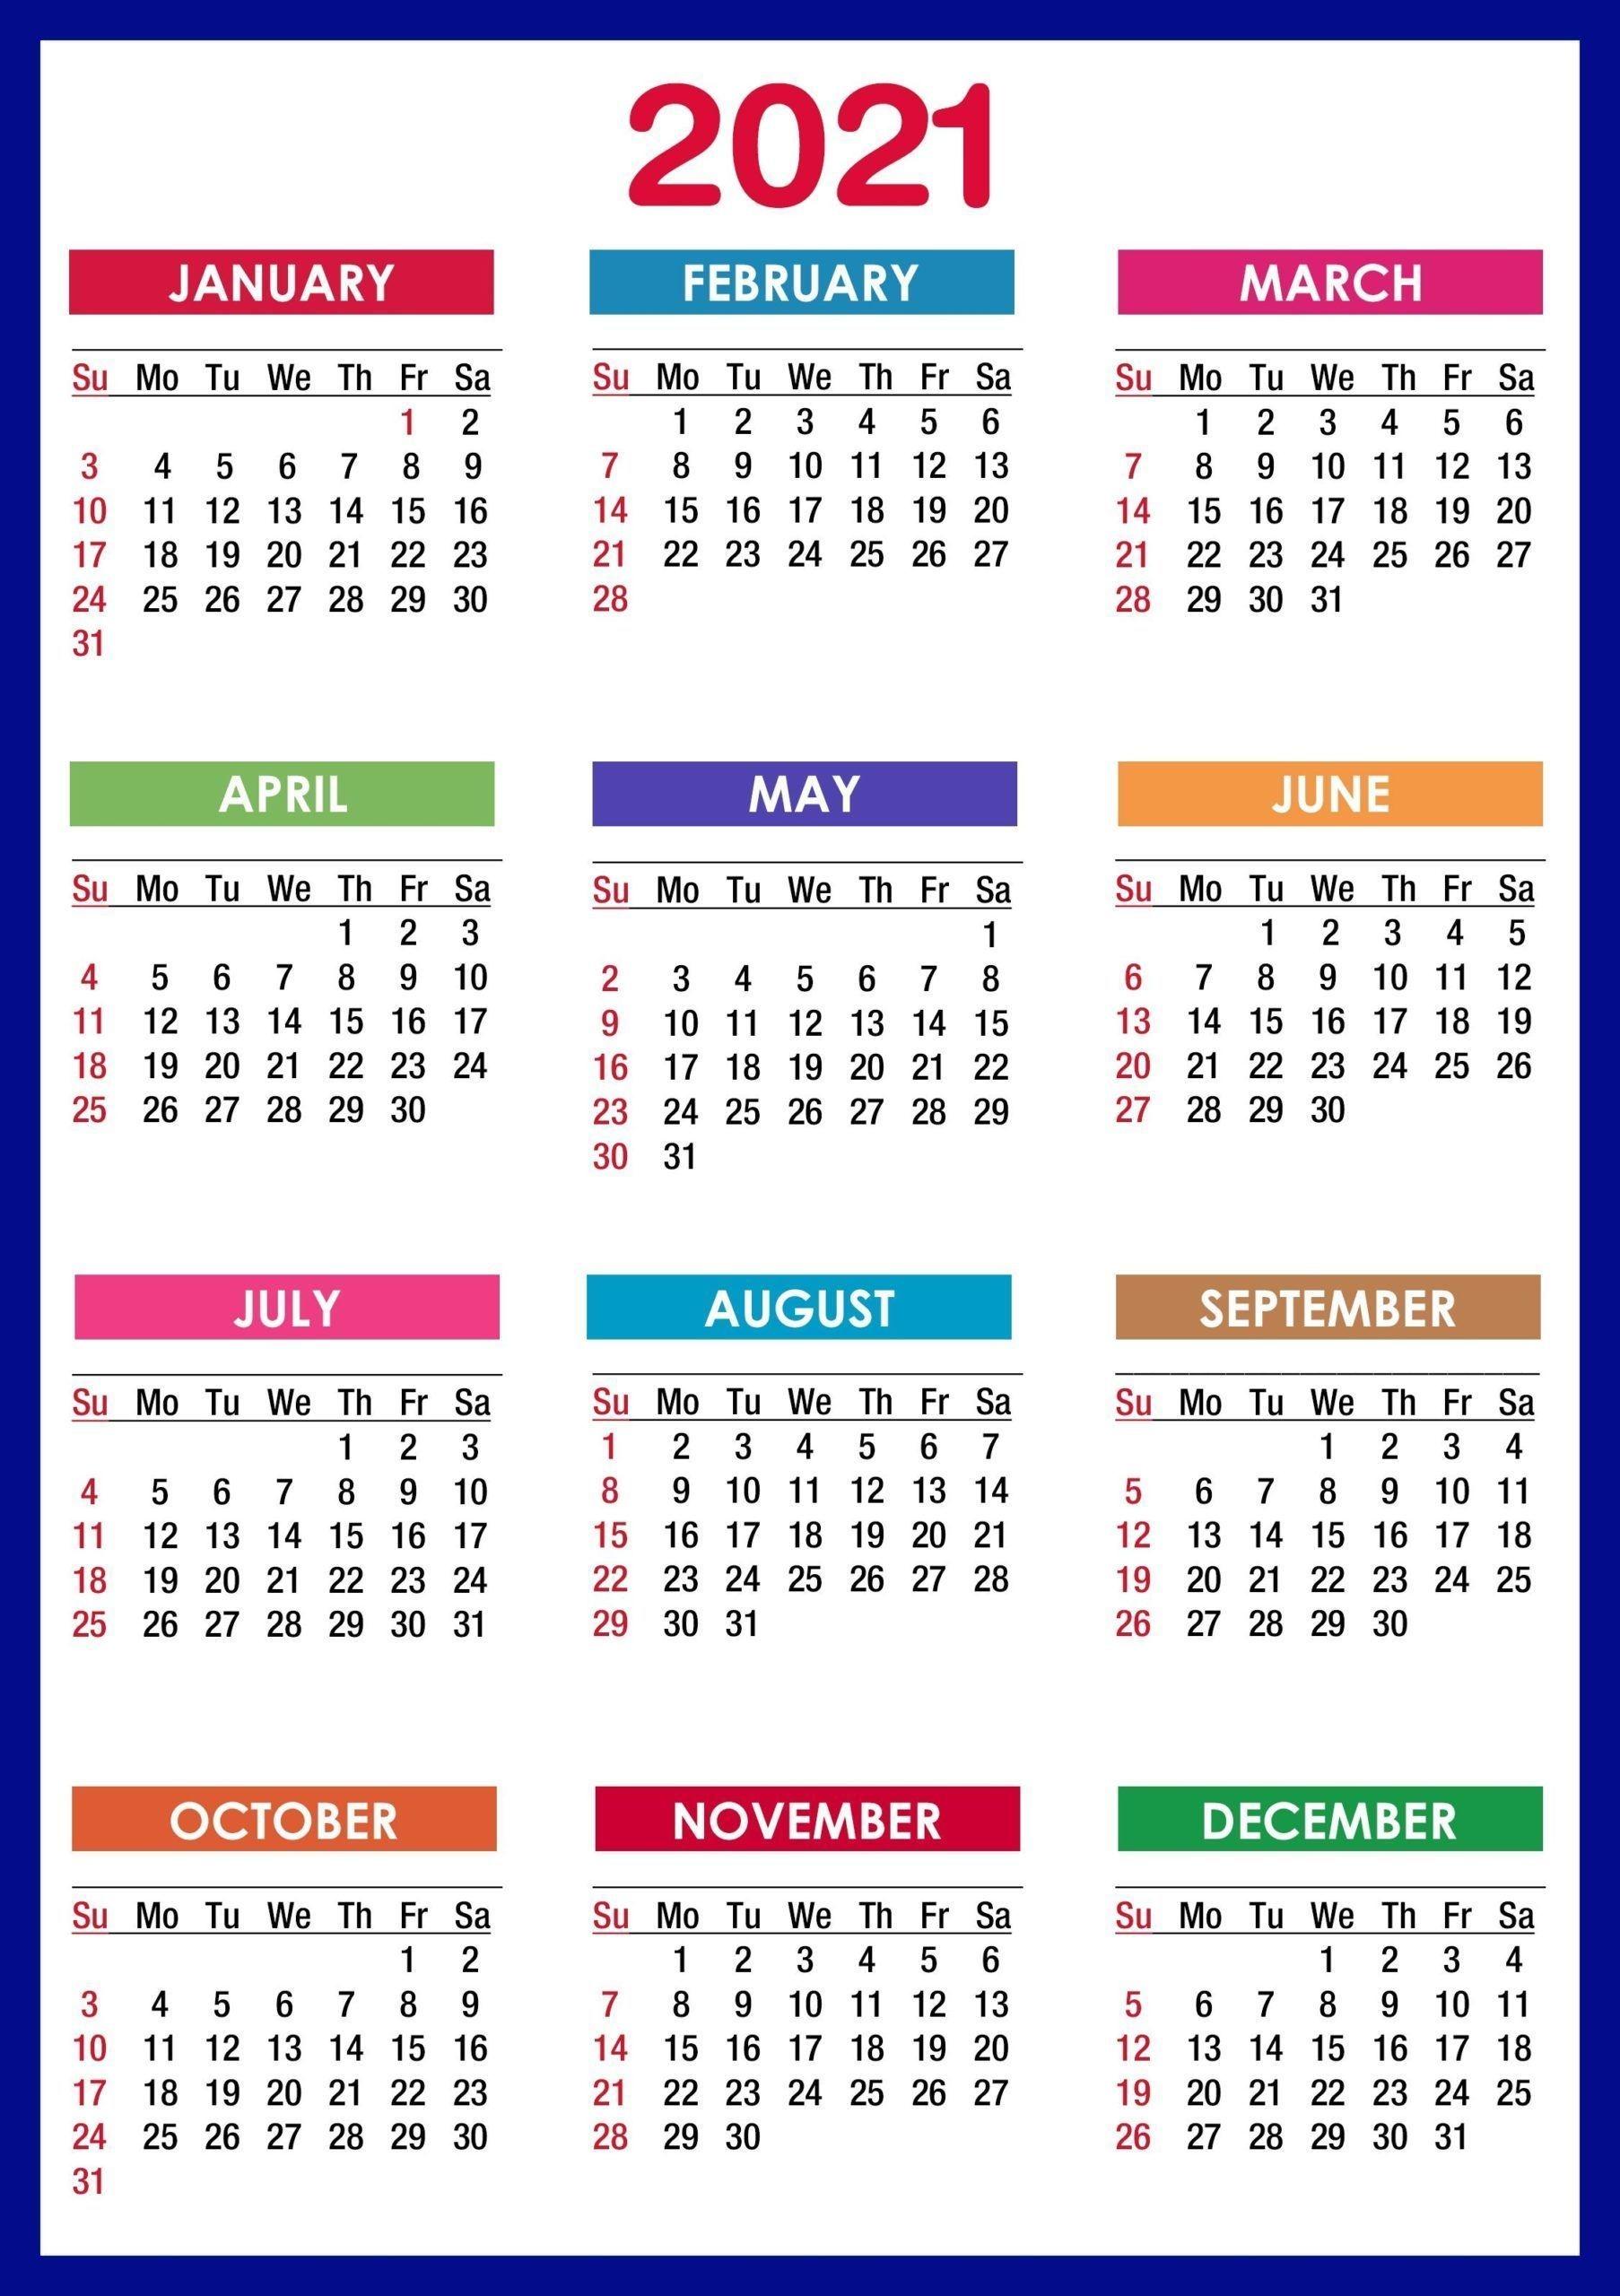 Universal Sept Calendar 2021 With Holidays 8.5' X11' | Get ...